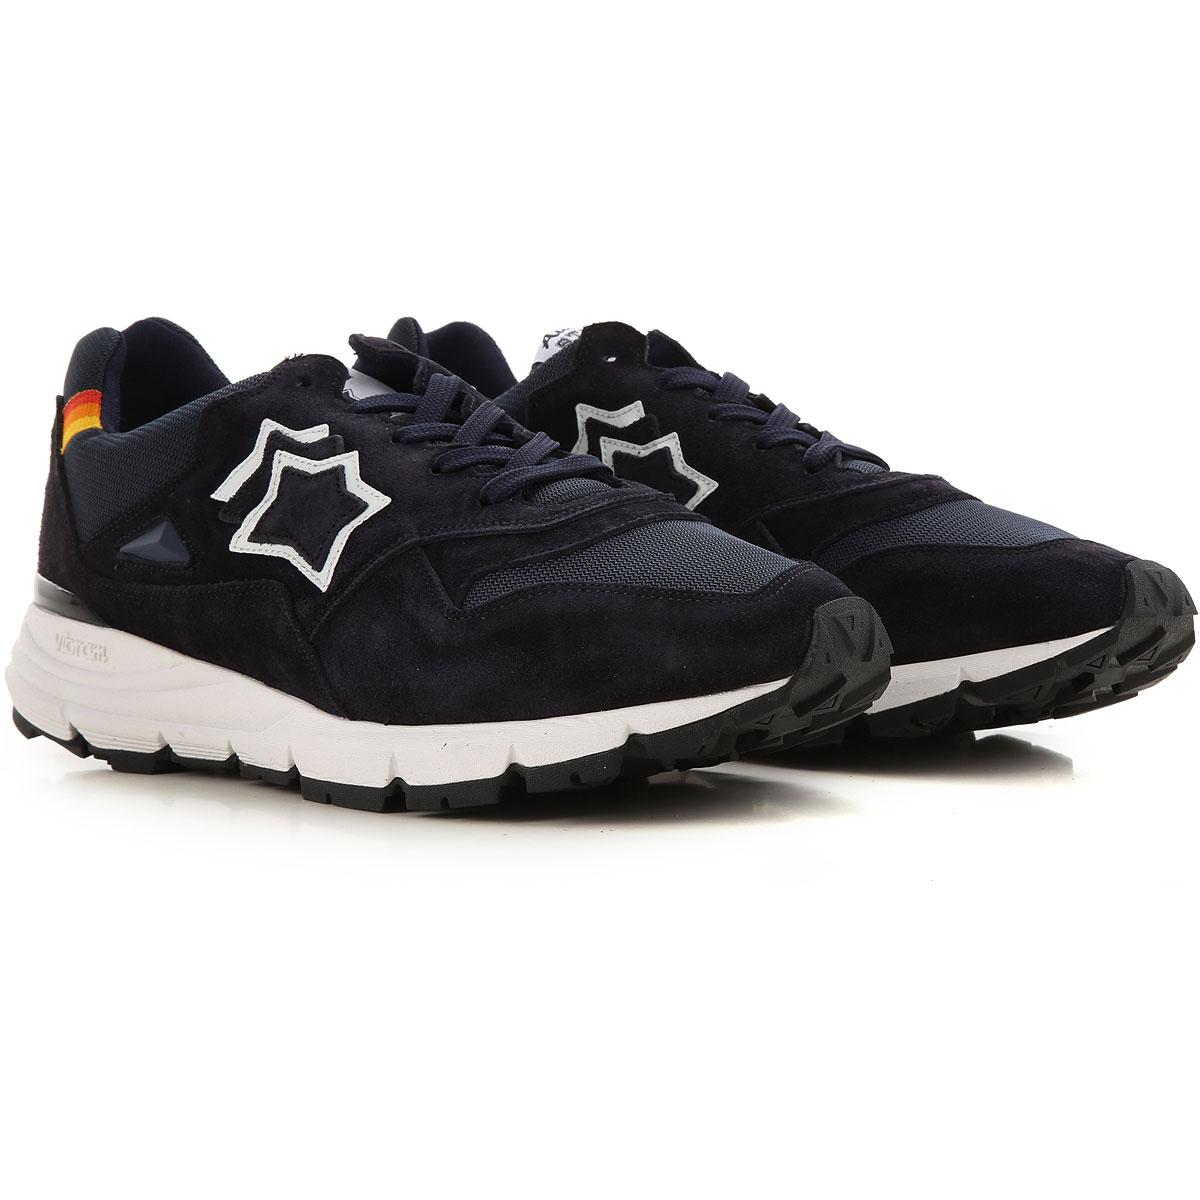 Atlantic Stars Sneakers for Men On Sale, Black, Leather, 2019, 10 10.5 11.5 9